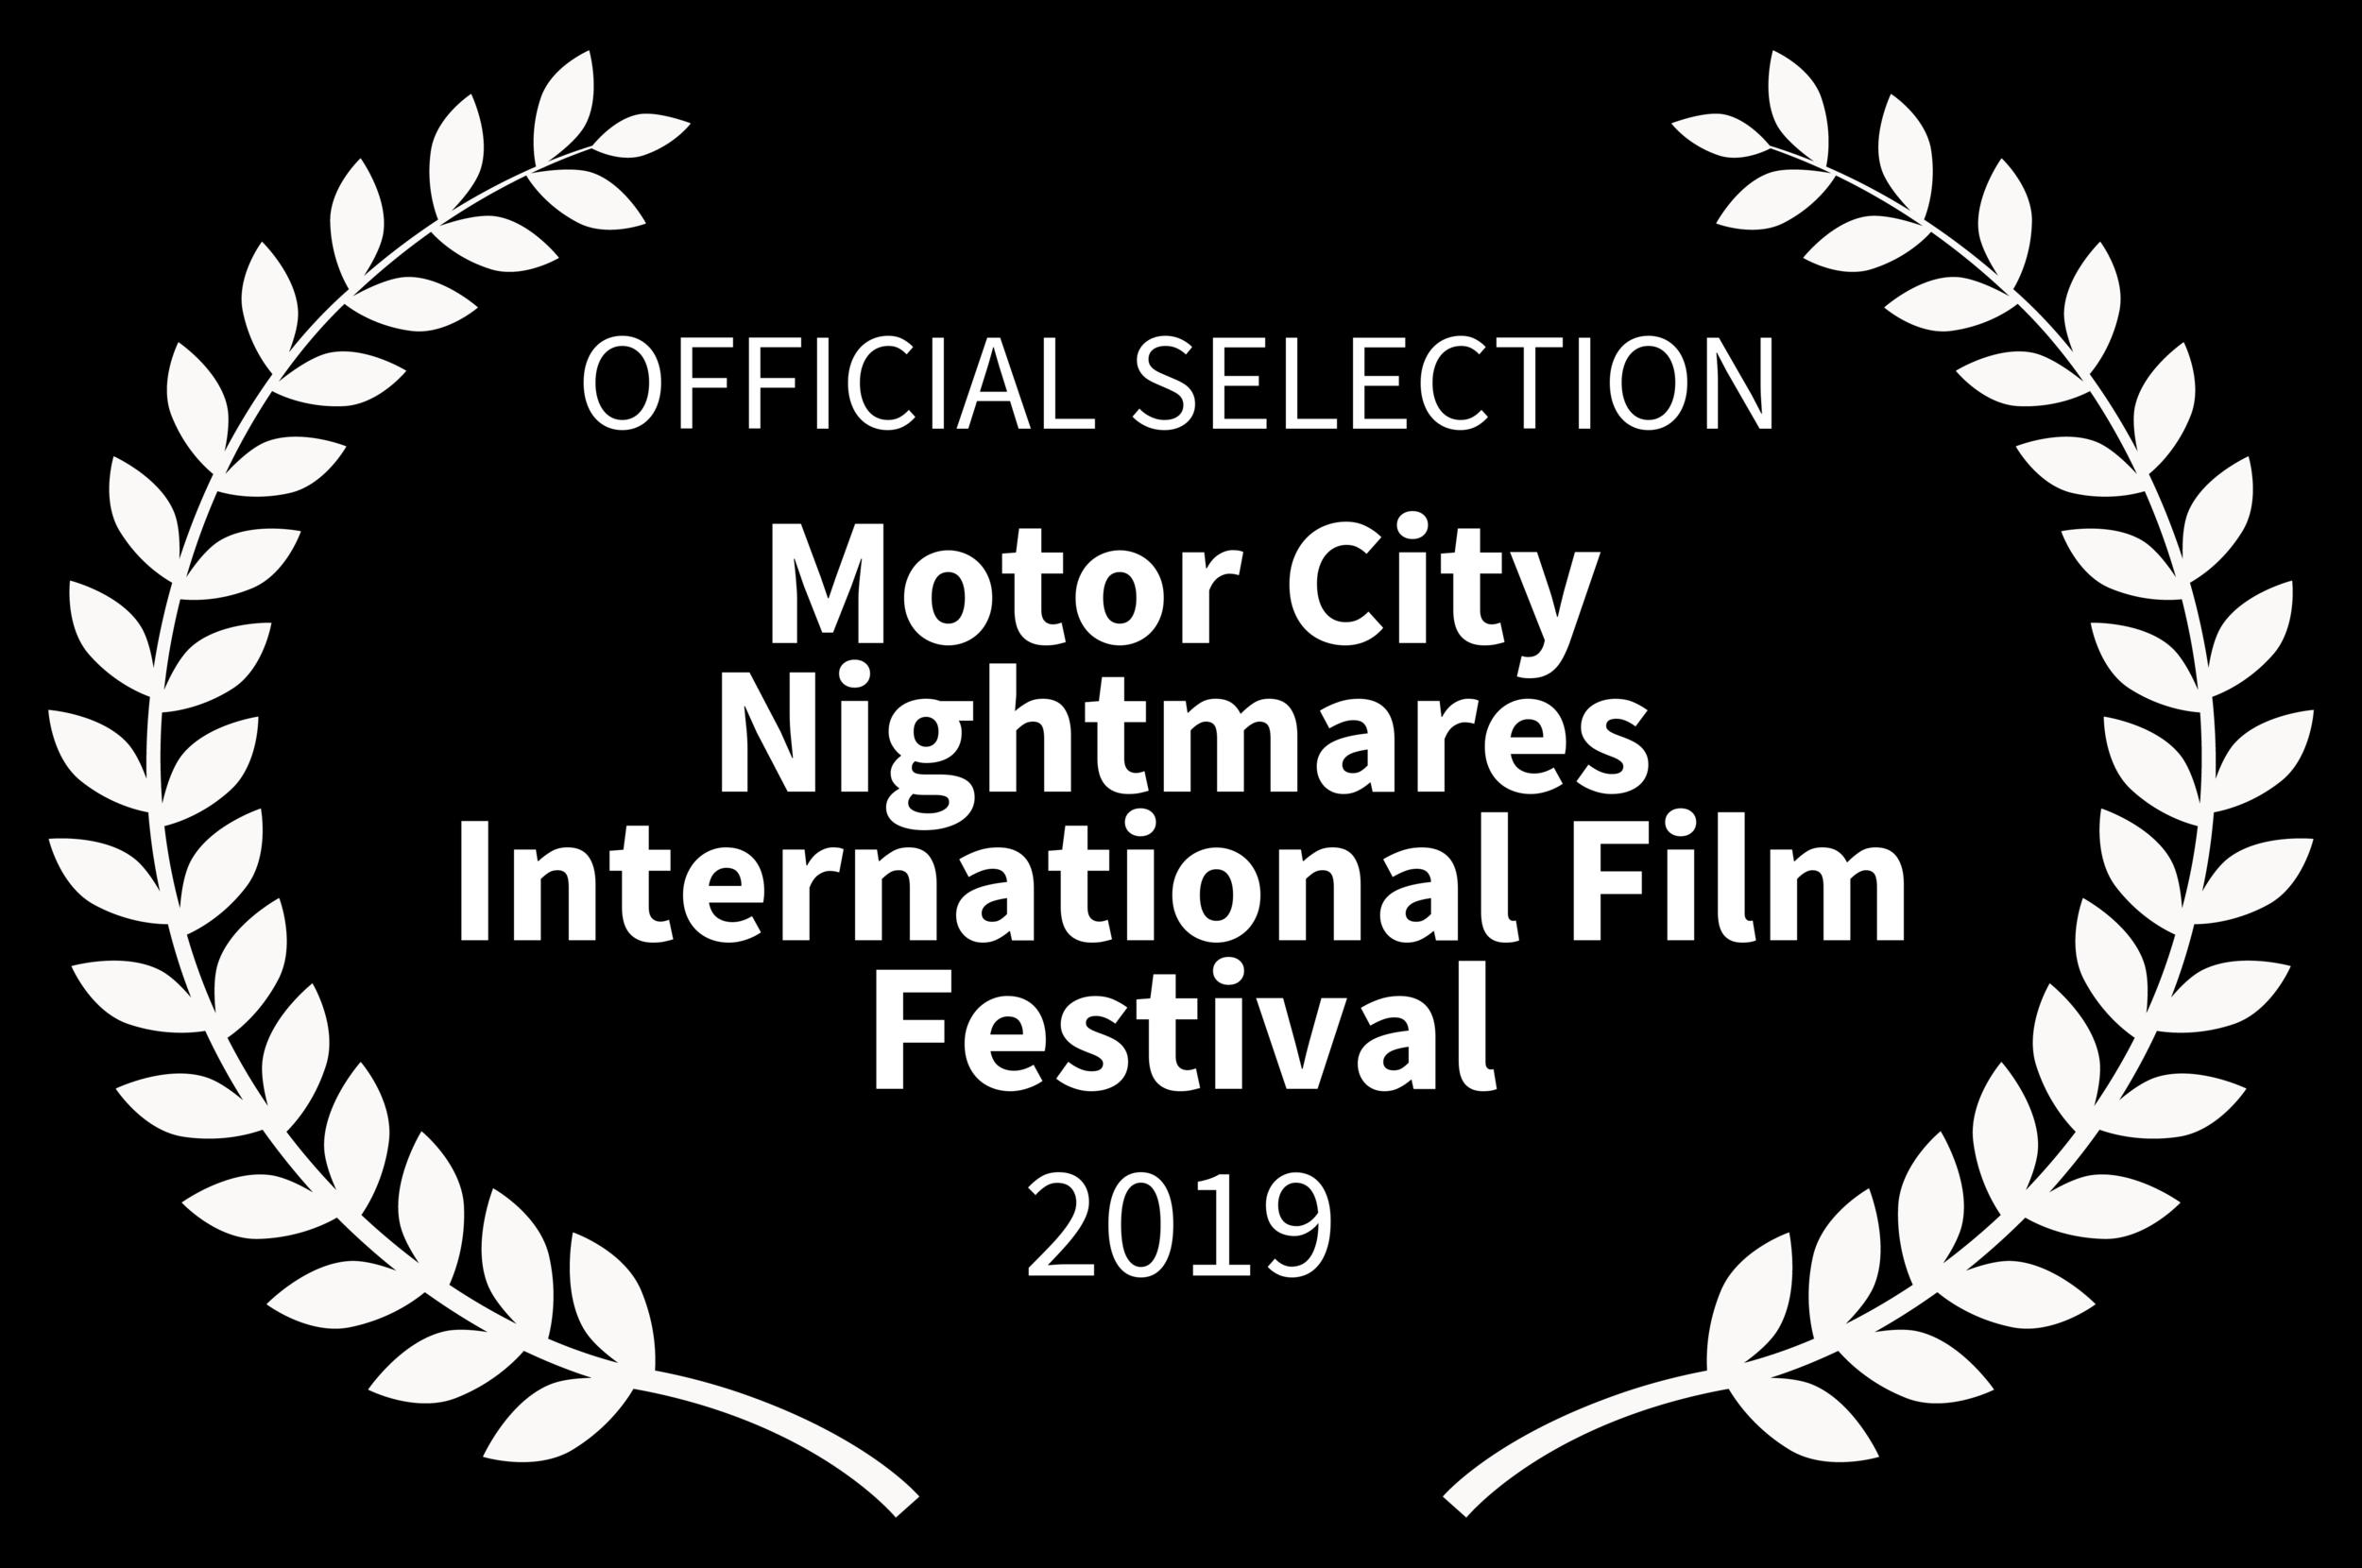 Rondo_MotorCityNightmaresInternationalFilmFestival-2019 copy.png